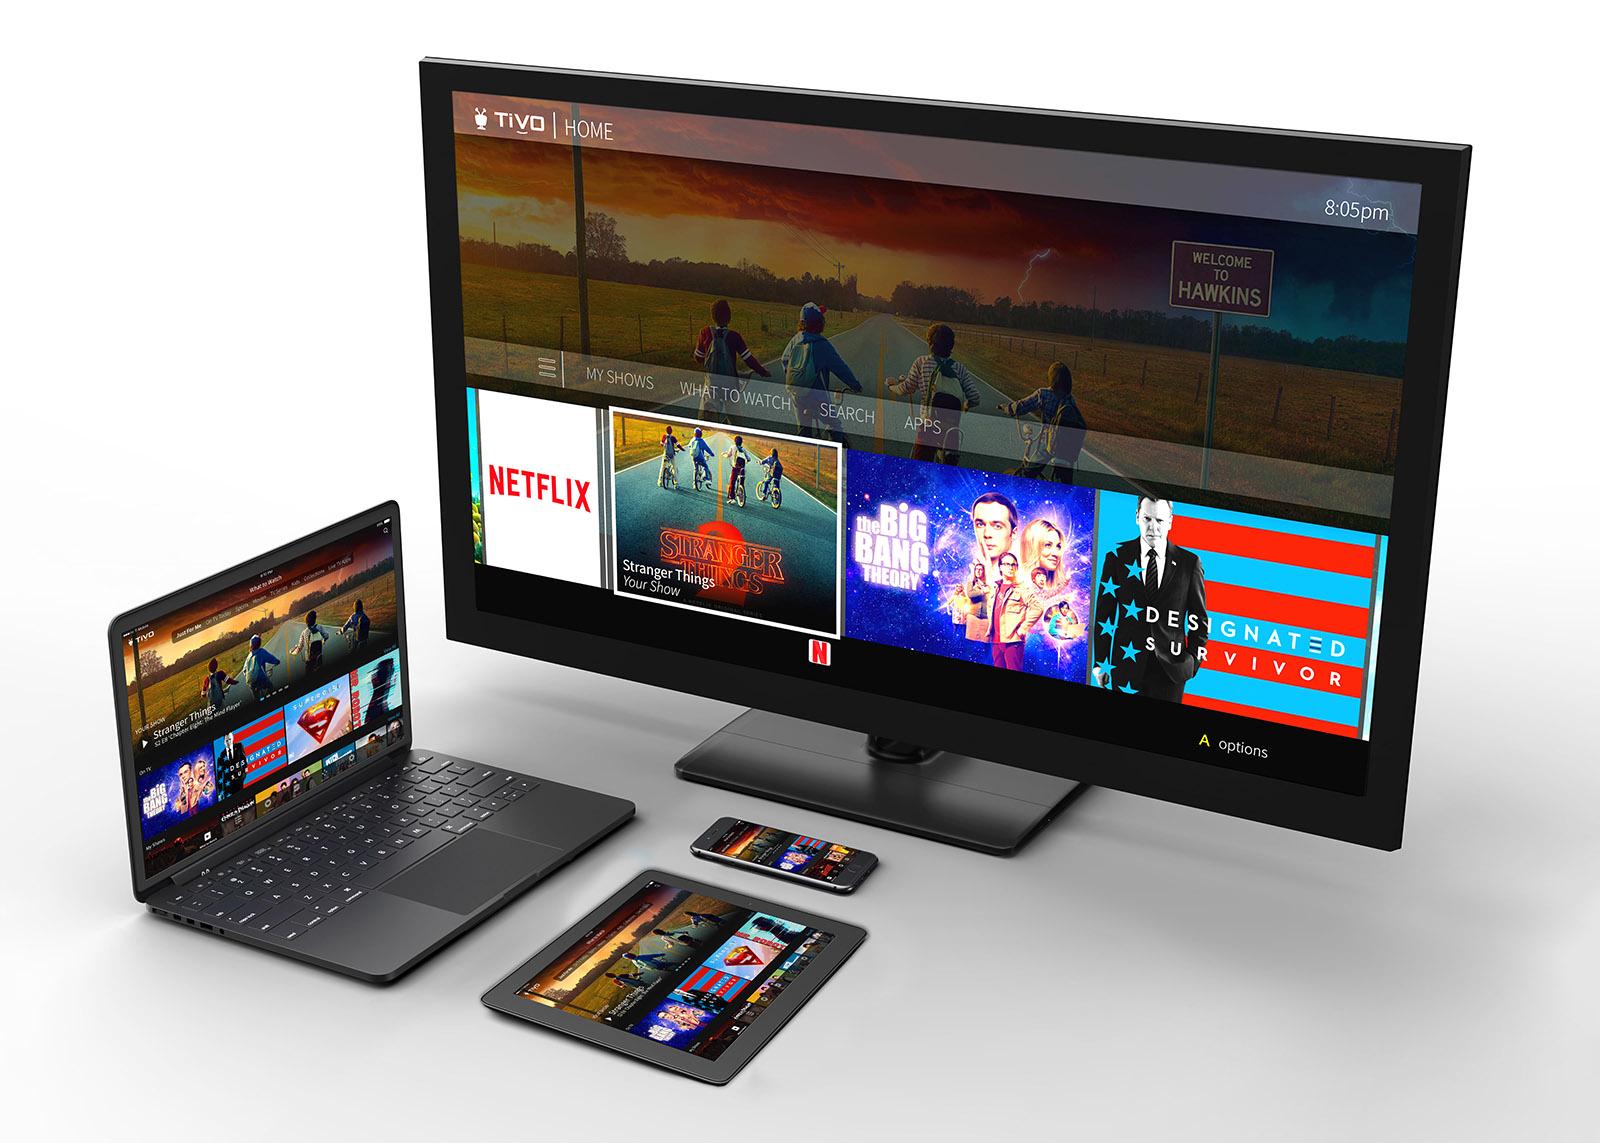 Tivo's new TV platform